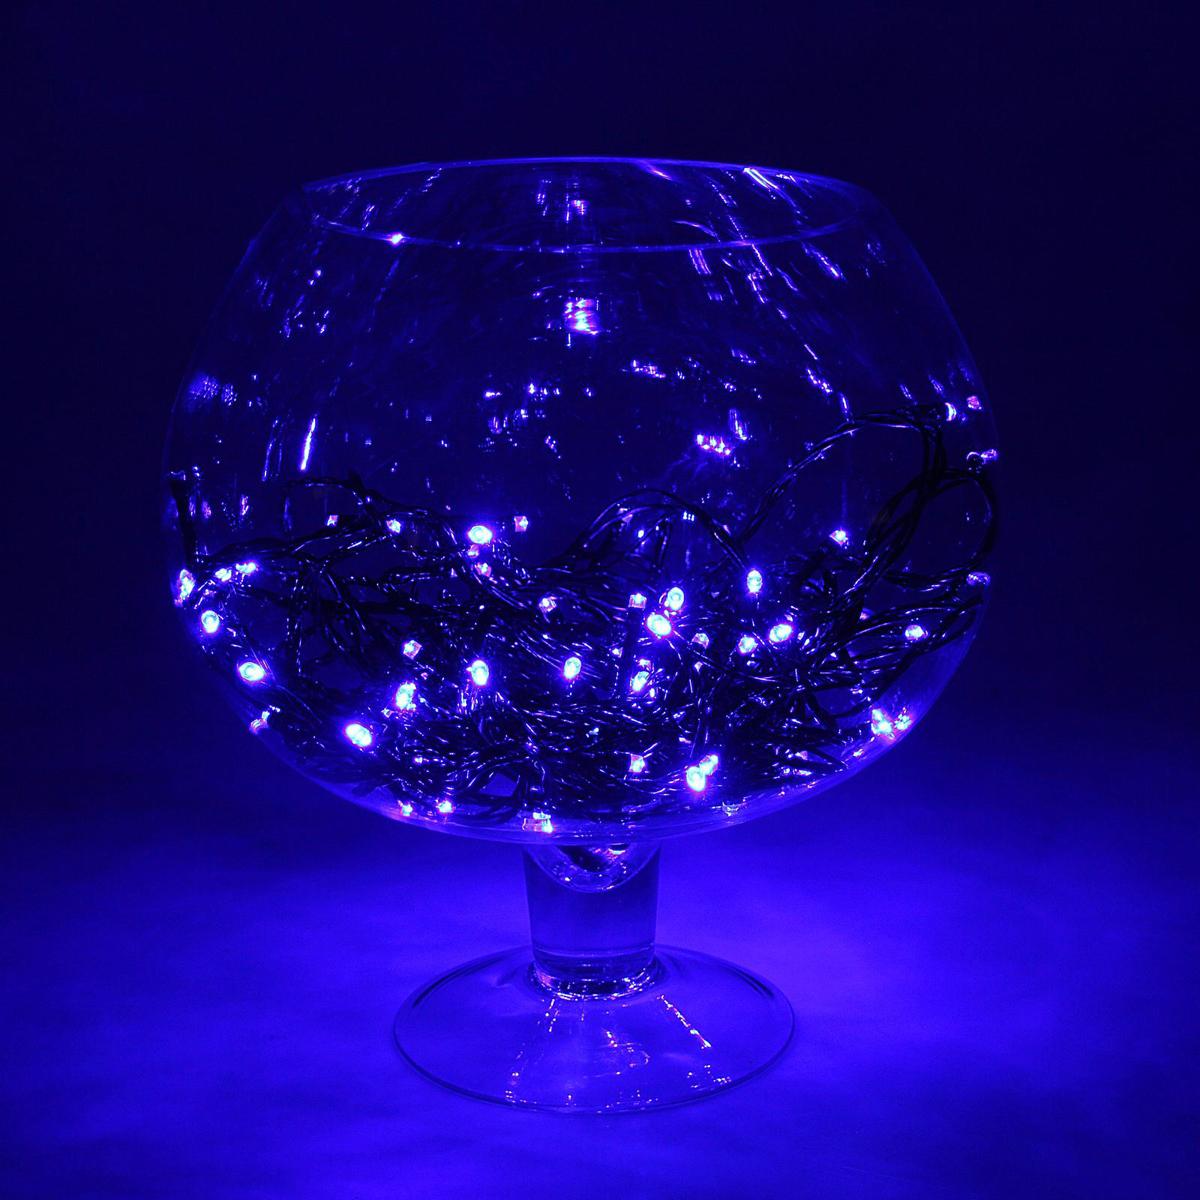 Гирлянда Luazon Метраж, длина 10 м, LED 100 ламп, 24В, цвет: синий. 1672032 гирлянда luazon спайдер led 600 24в 20m multicolor 1586037